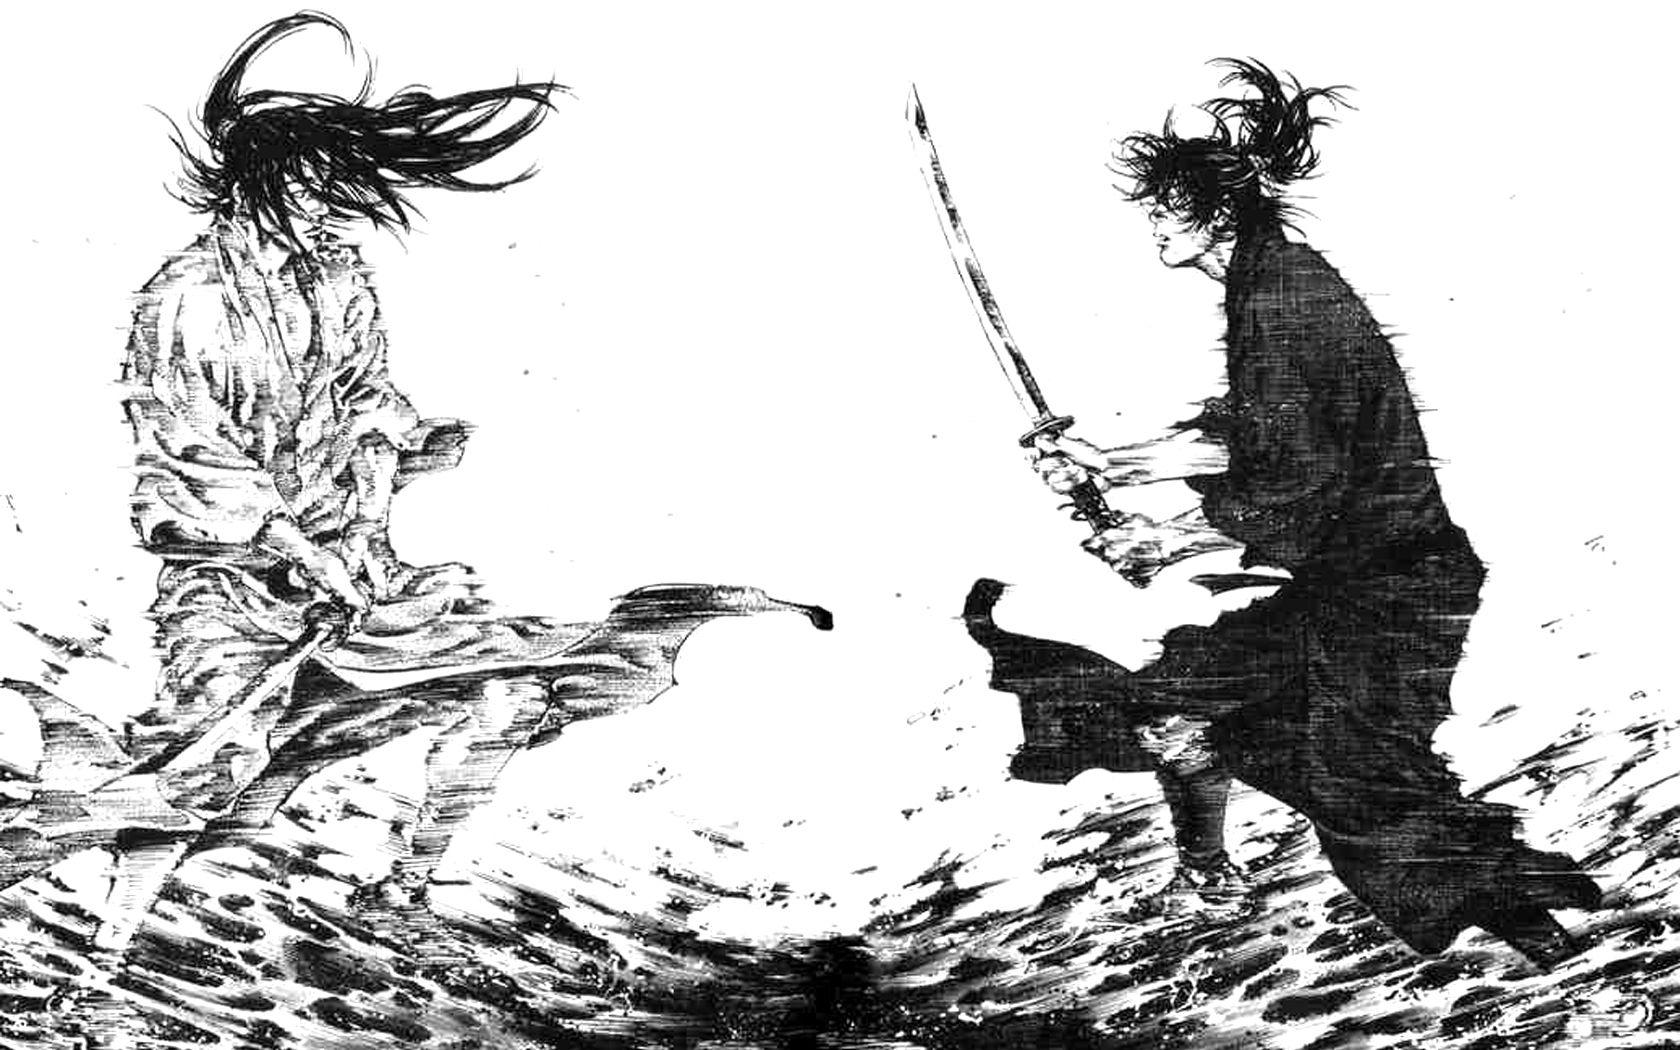 Vagabond Kojiro Musashi Manga Samurai Art Samurai Artwork